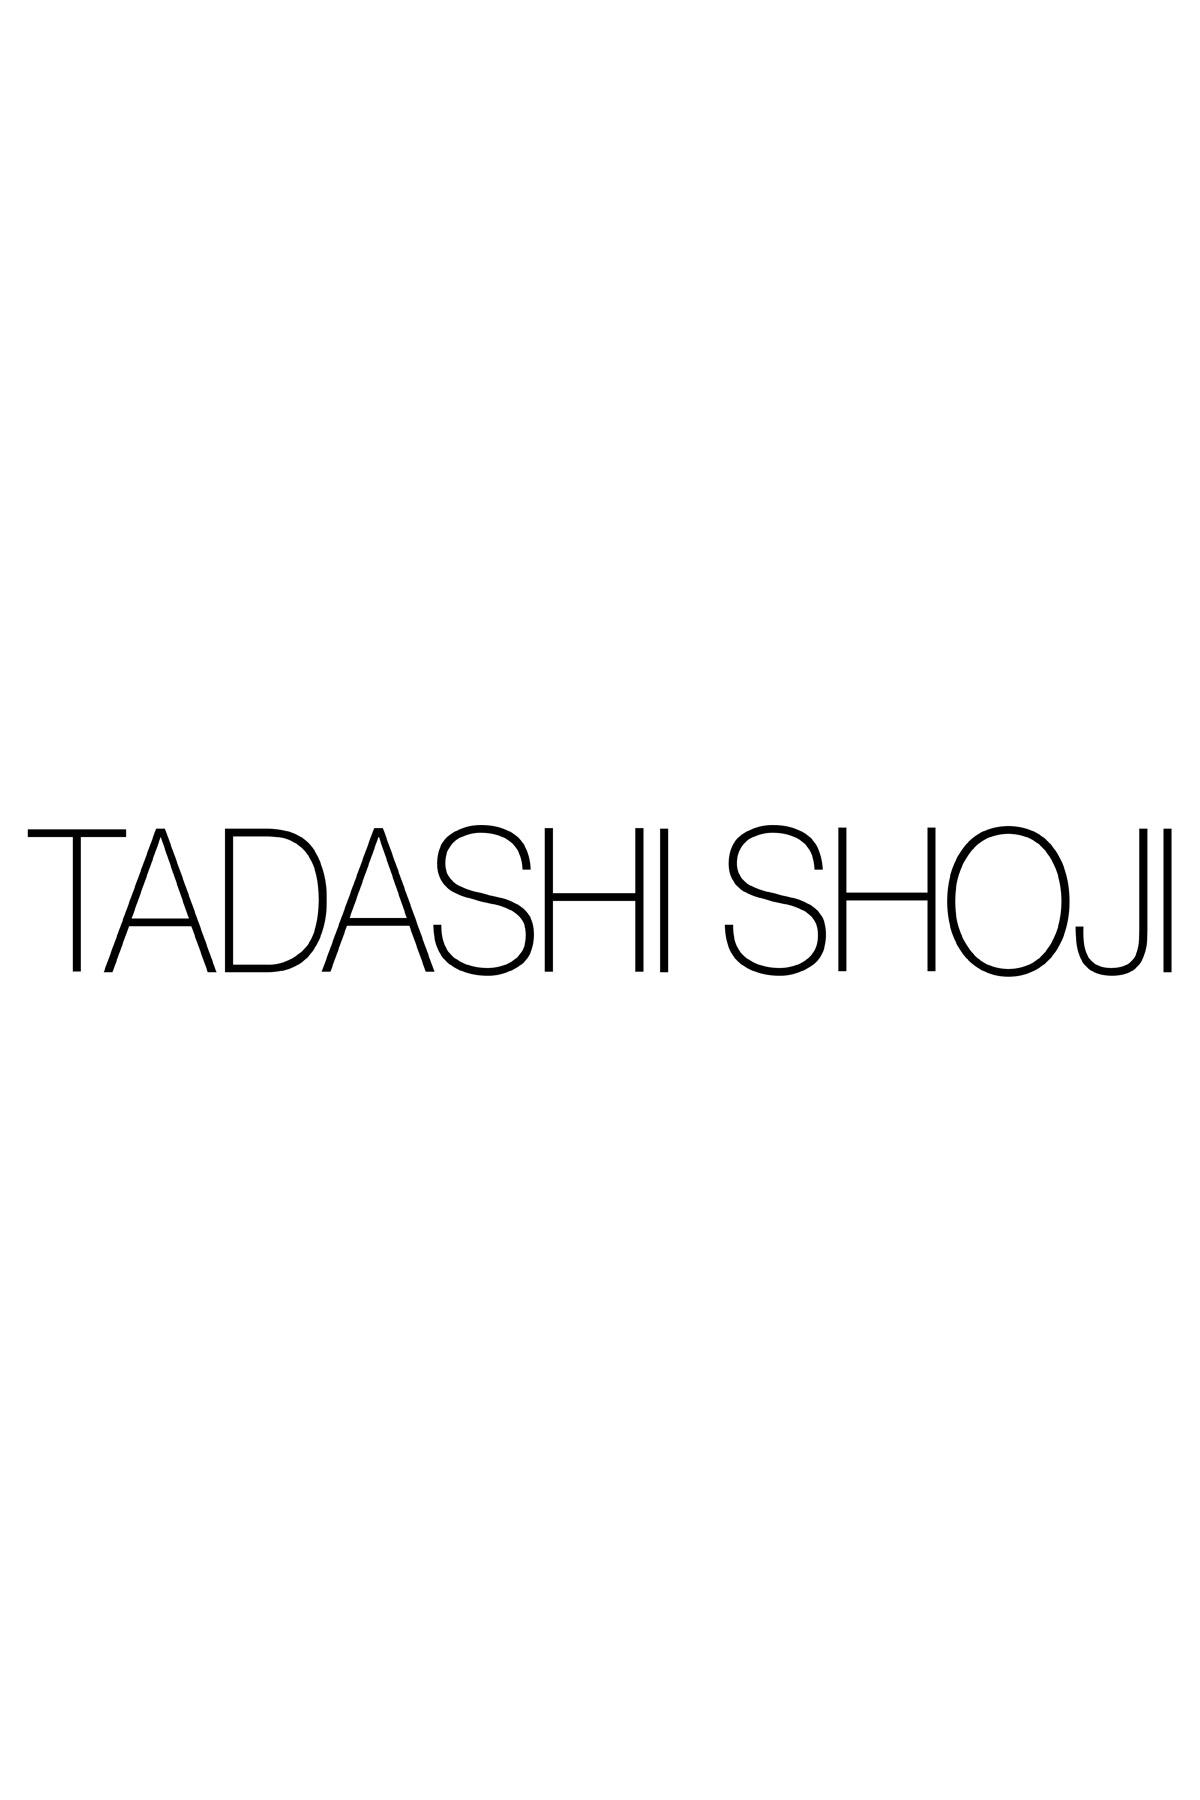 Tadashi Shoji - Endeavor Embroidered Strap Gown